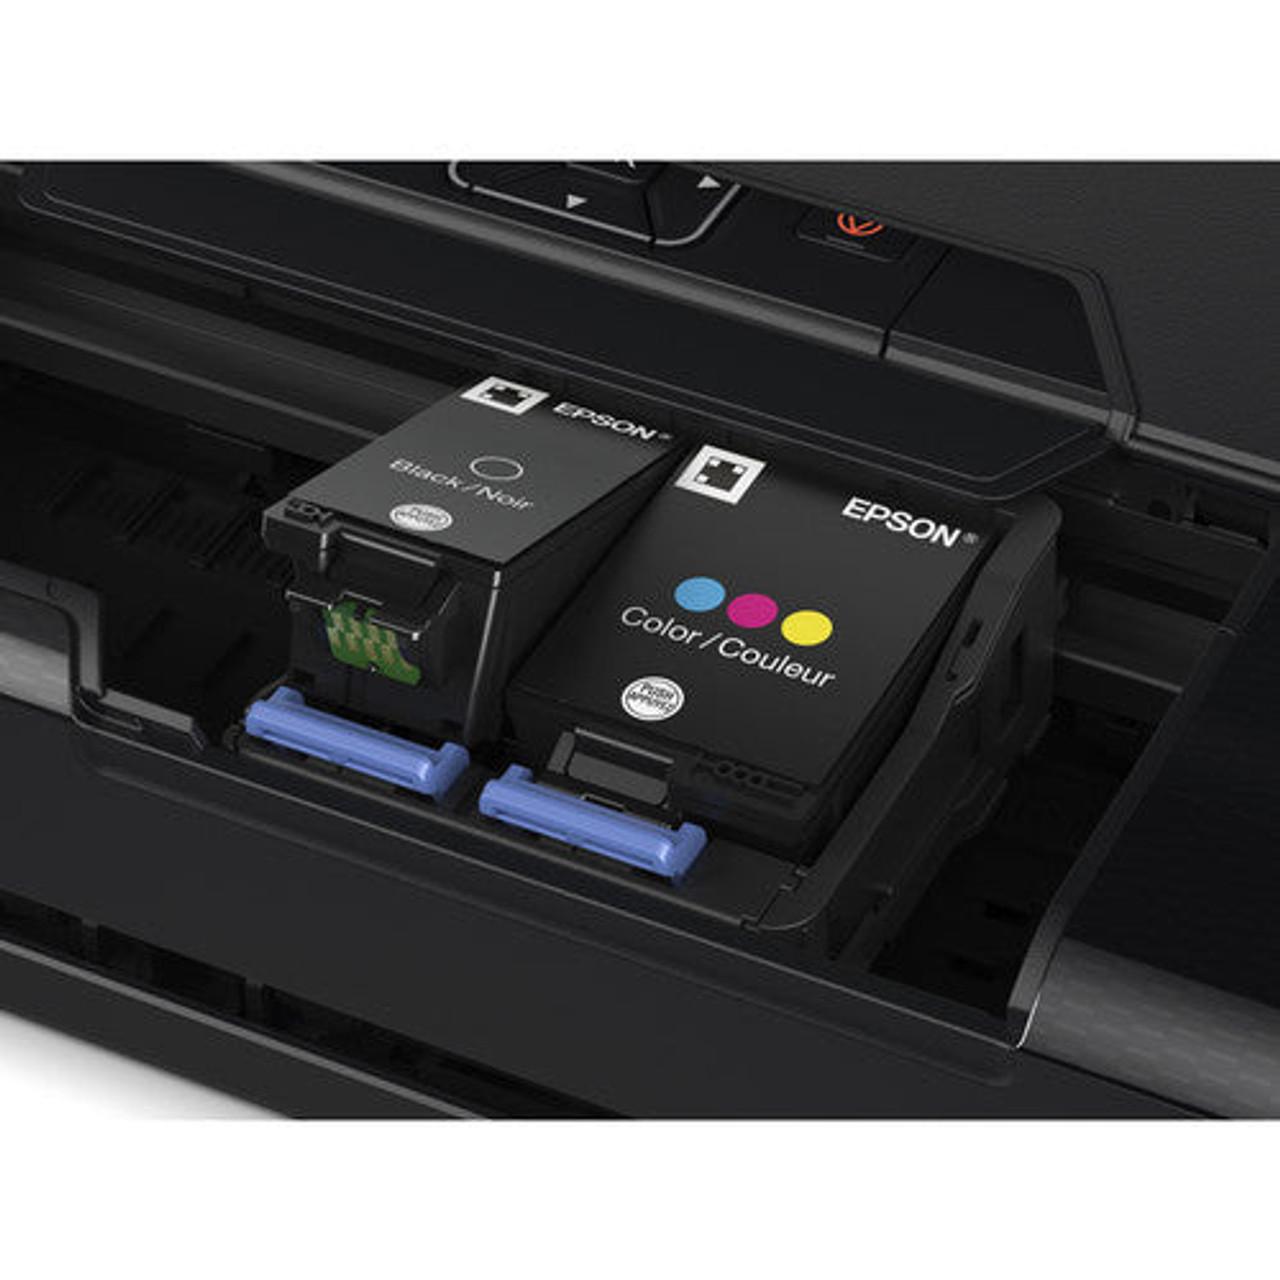 Epson C11CH25201-RB WorkForce WF-110 Wireless Mobile Inkjet Printer - Certified Refurbished